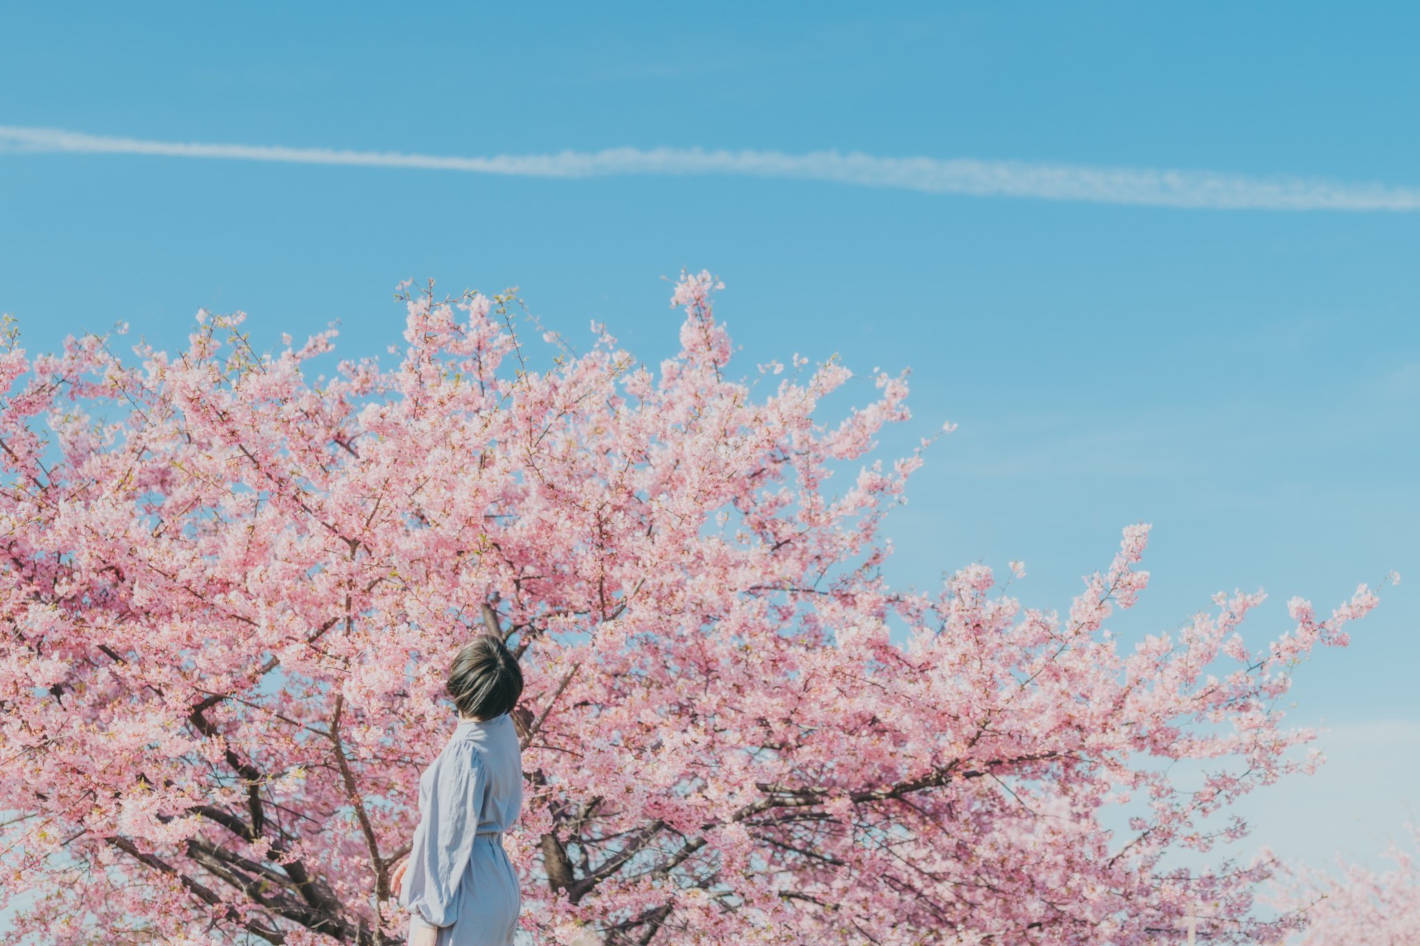 photo by MASAKIさん